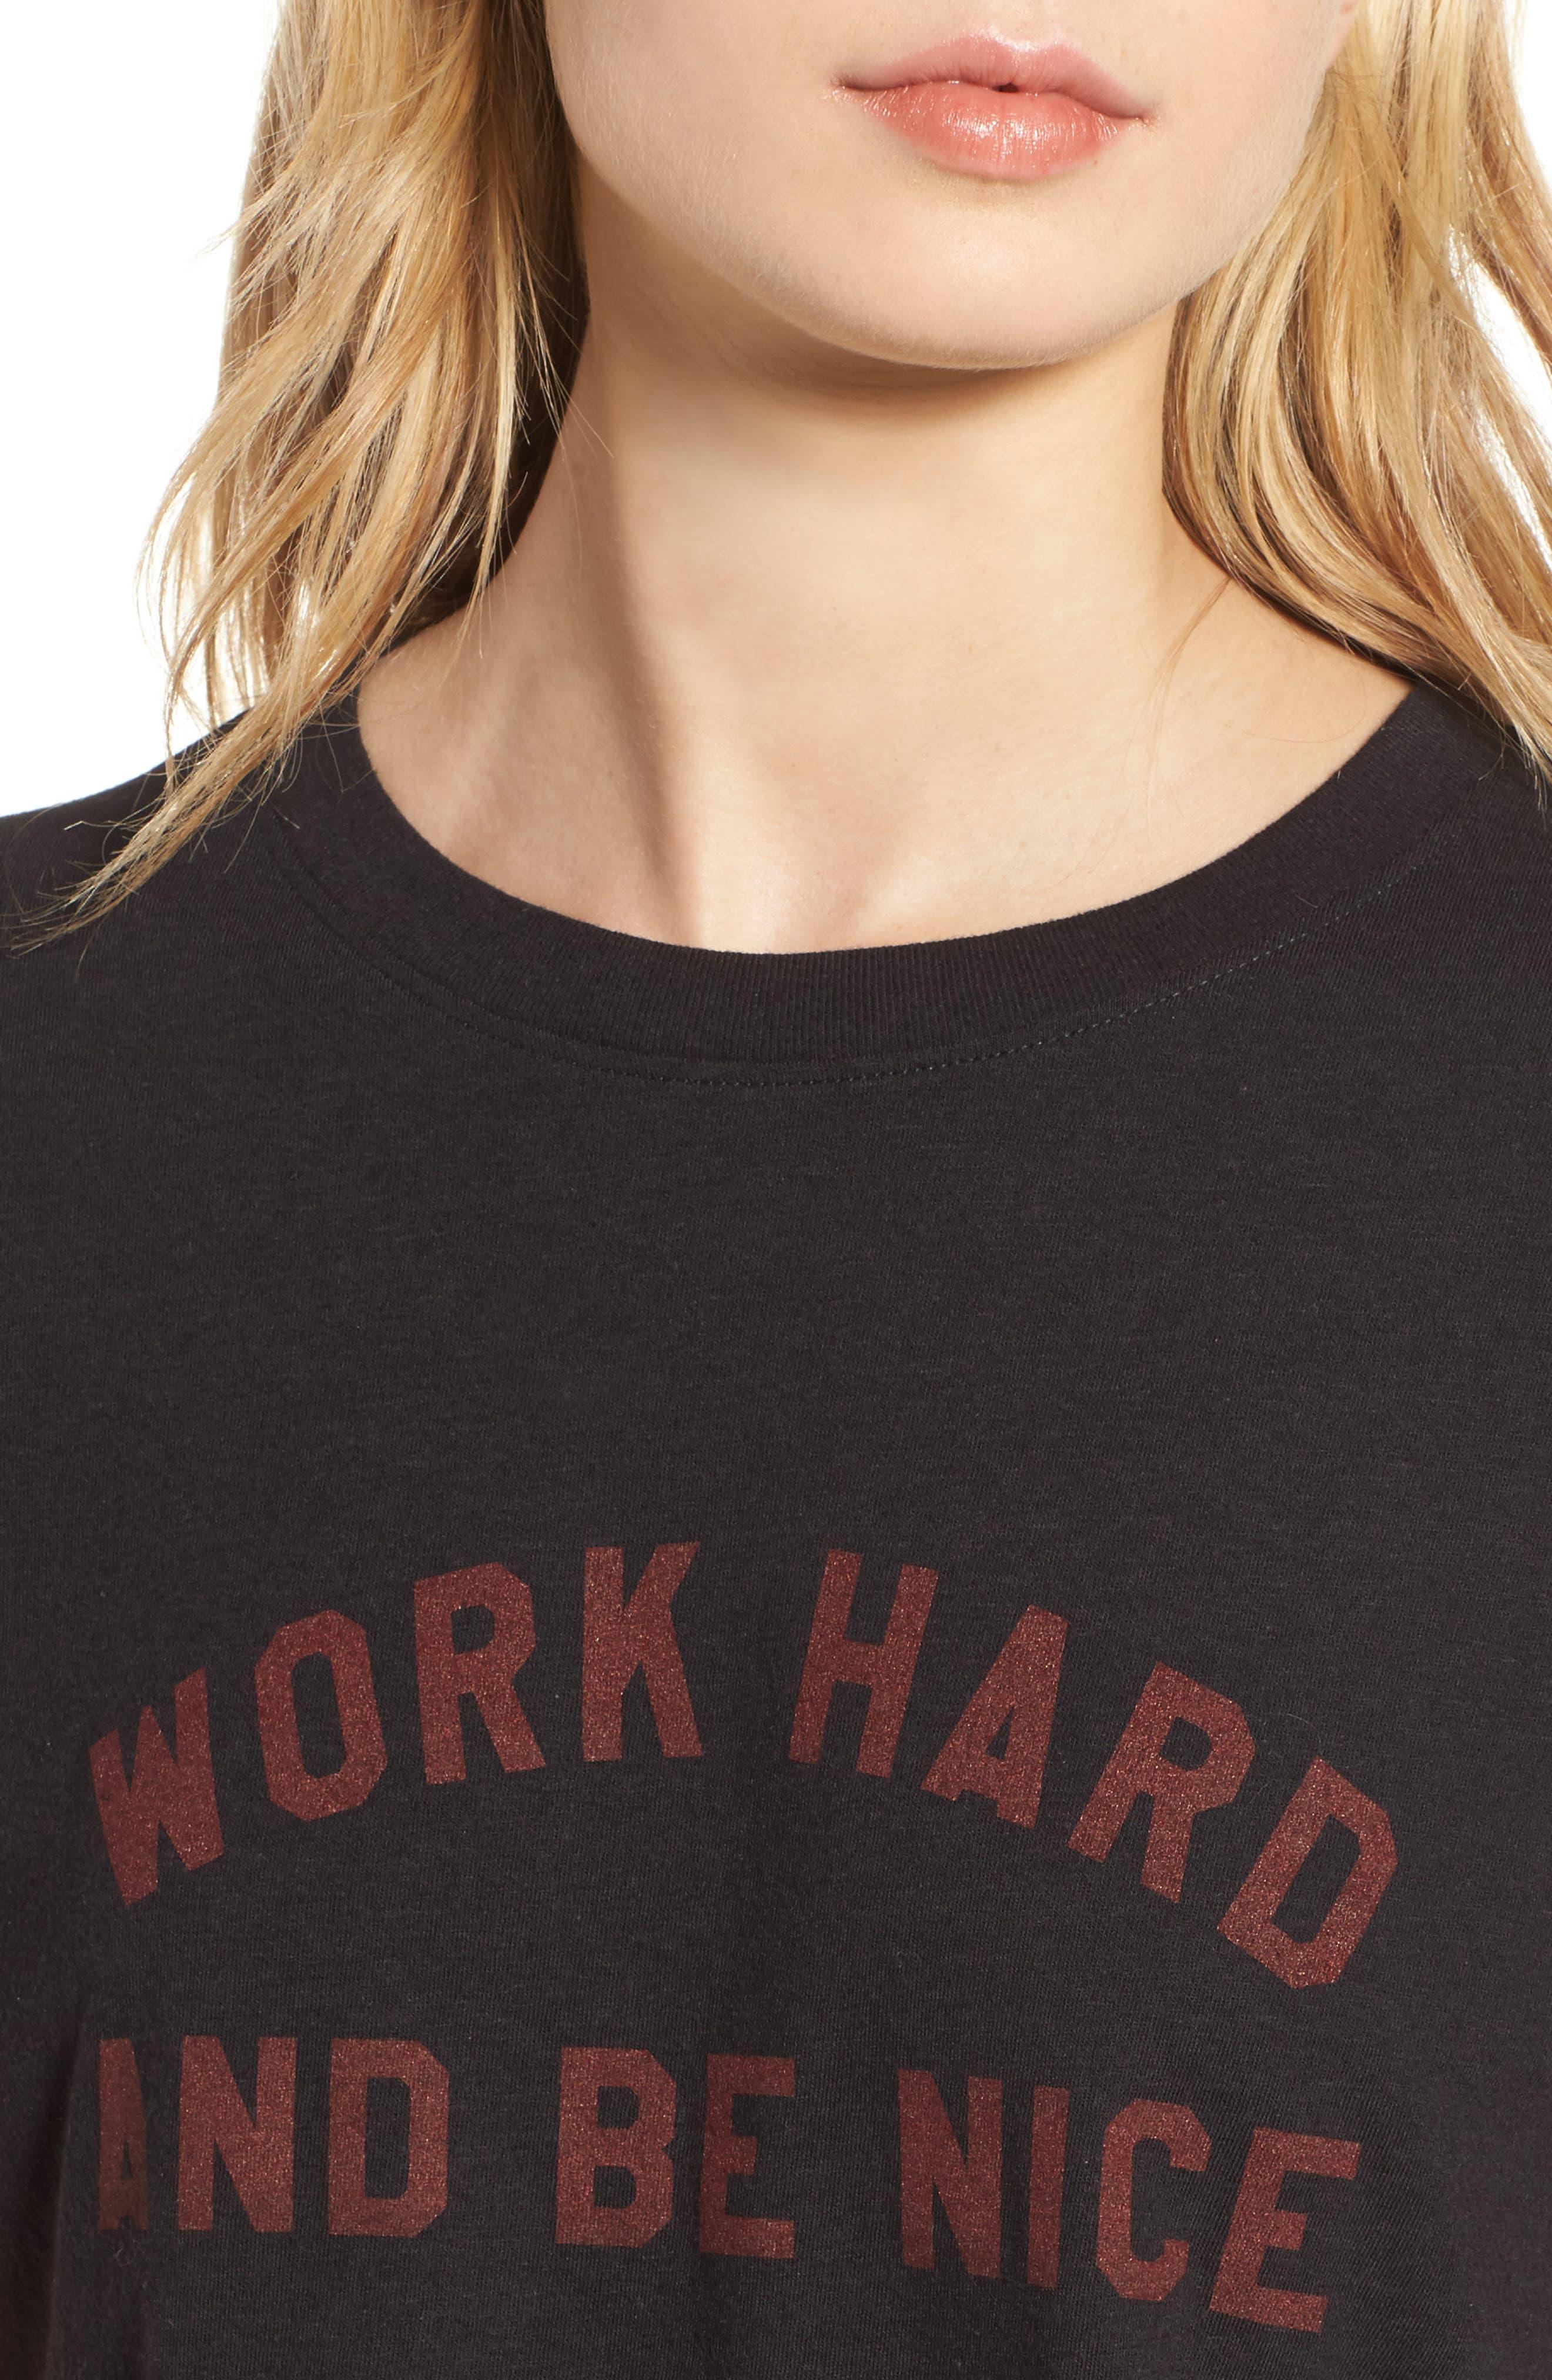 'Work Hard' Graphic Tee,                             Alternate thumbnail 4, color,                             Black